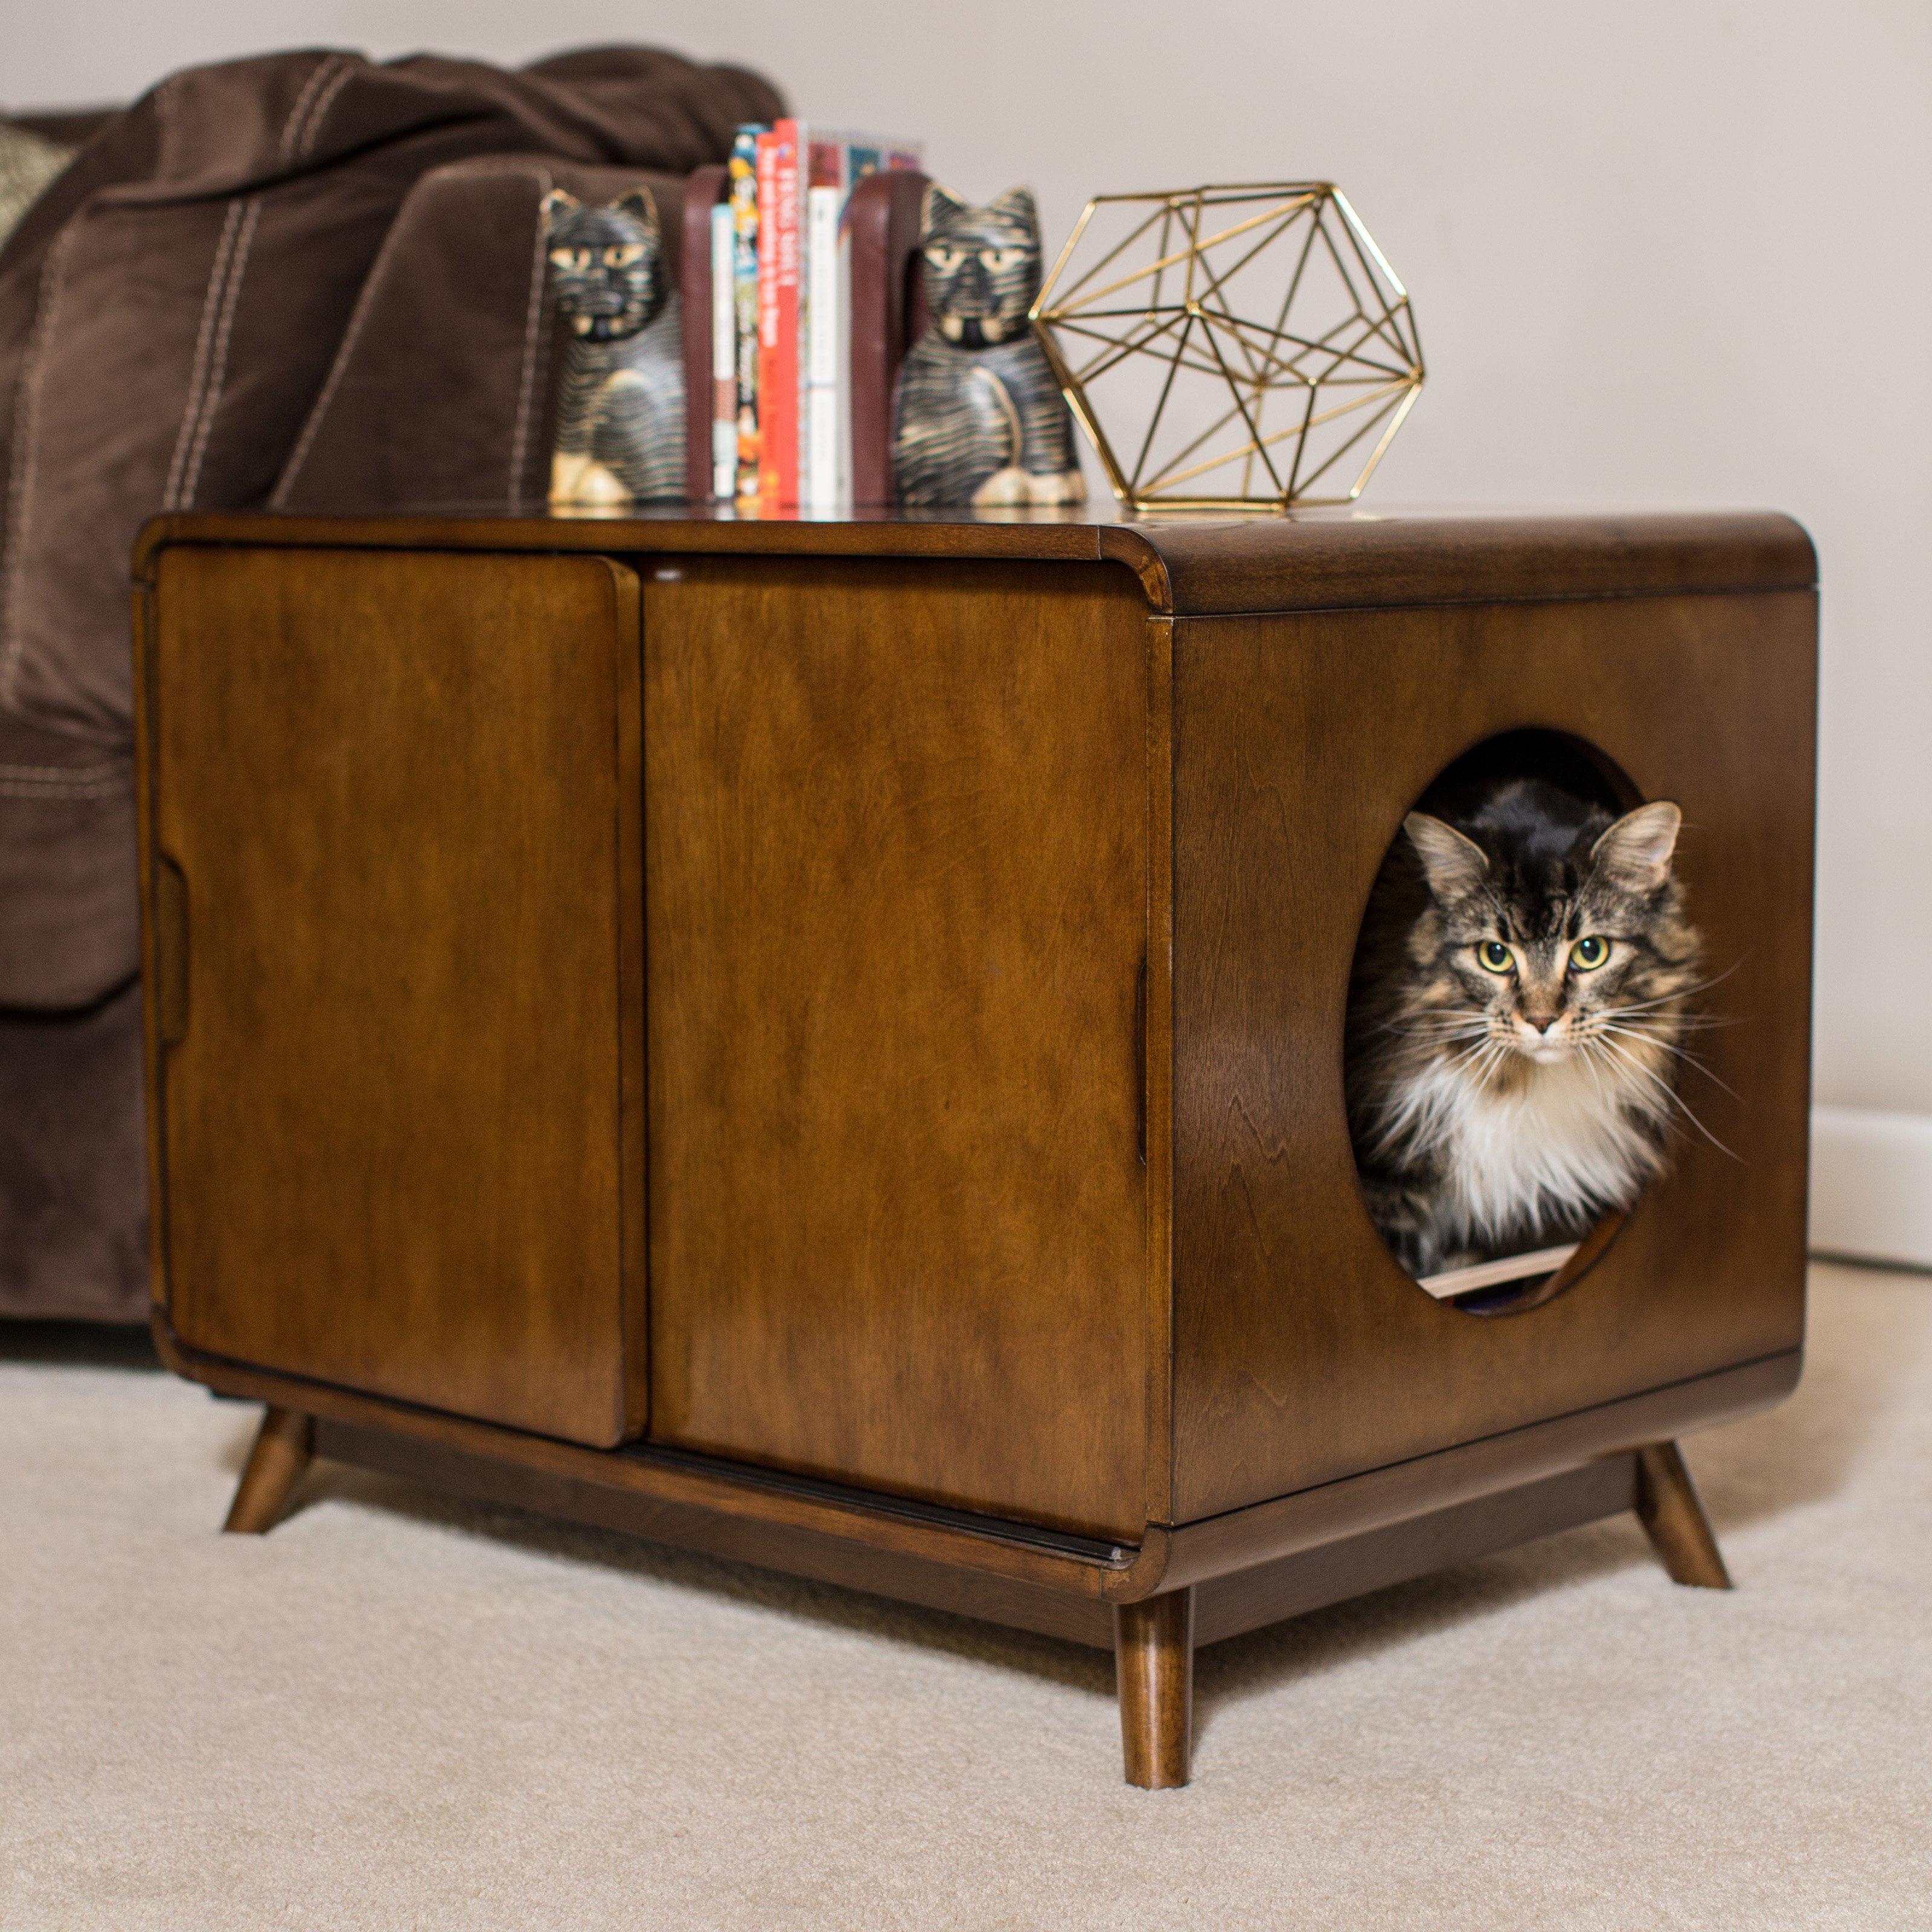 Boomer & George Carter Mid-Century Modern Cat Litter Box